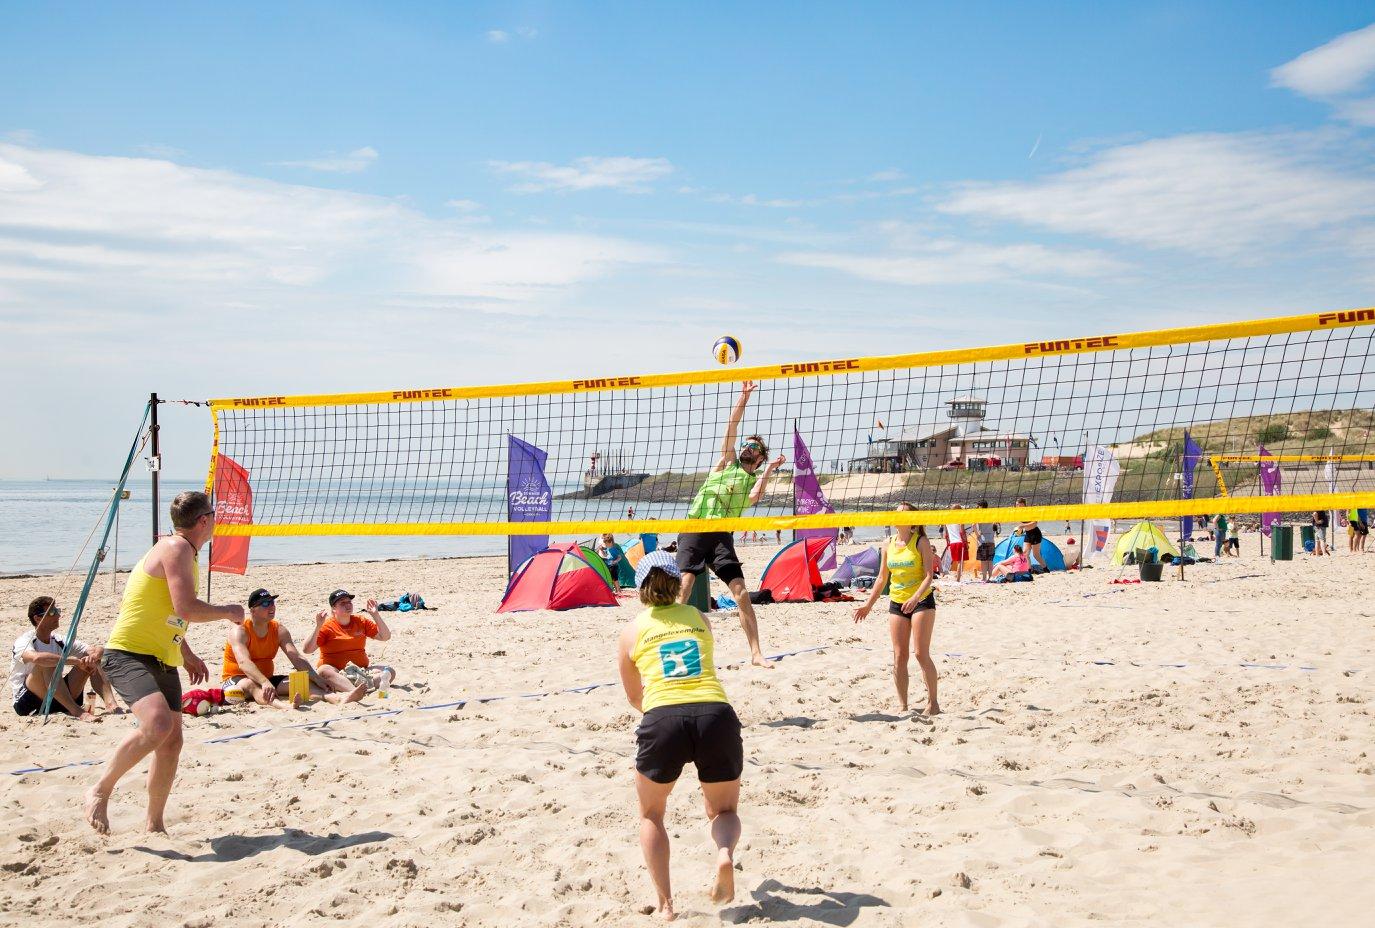 Moofpeople hoofdsponsor van Summer BeachVolleyball